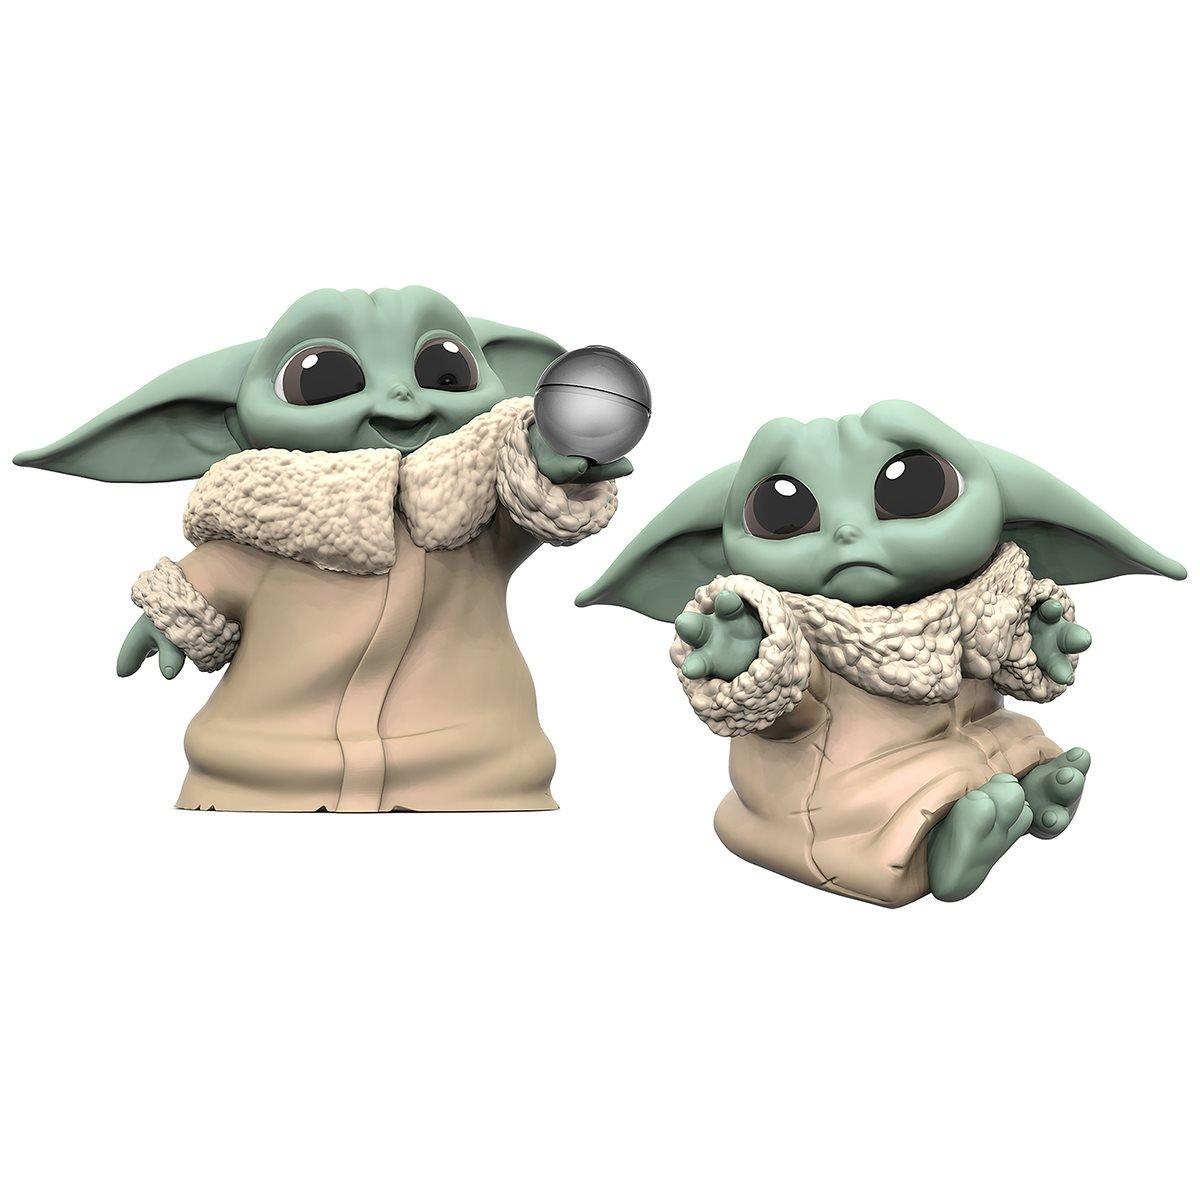 Hasbro - Star Wars - The Mandalorian - Baby Yoda - Baby Bounties Hold Me and Ball Mini-Figures - 01